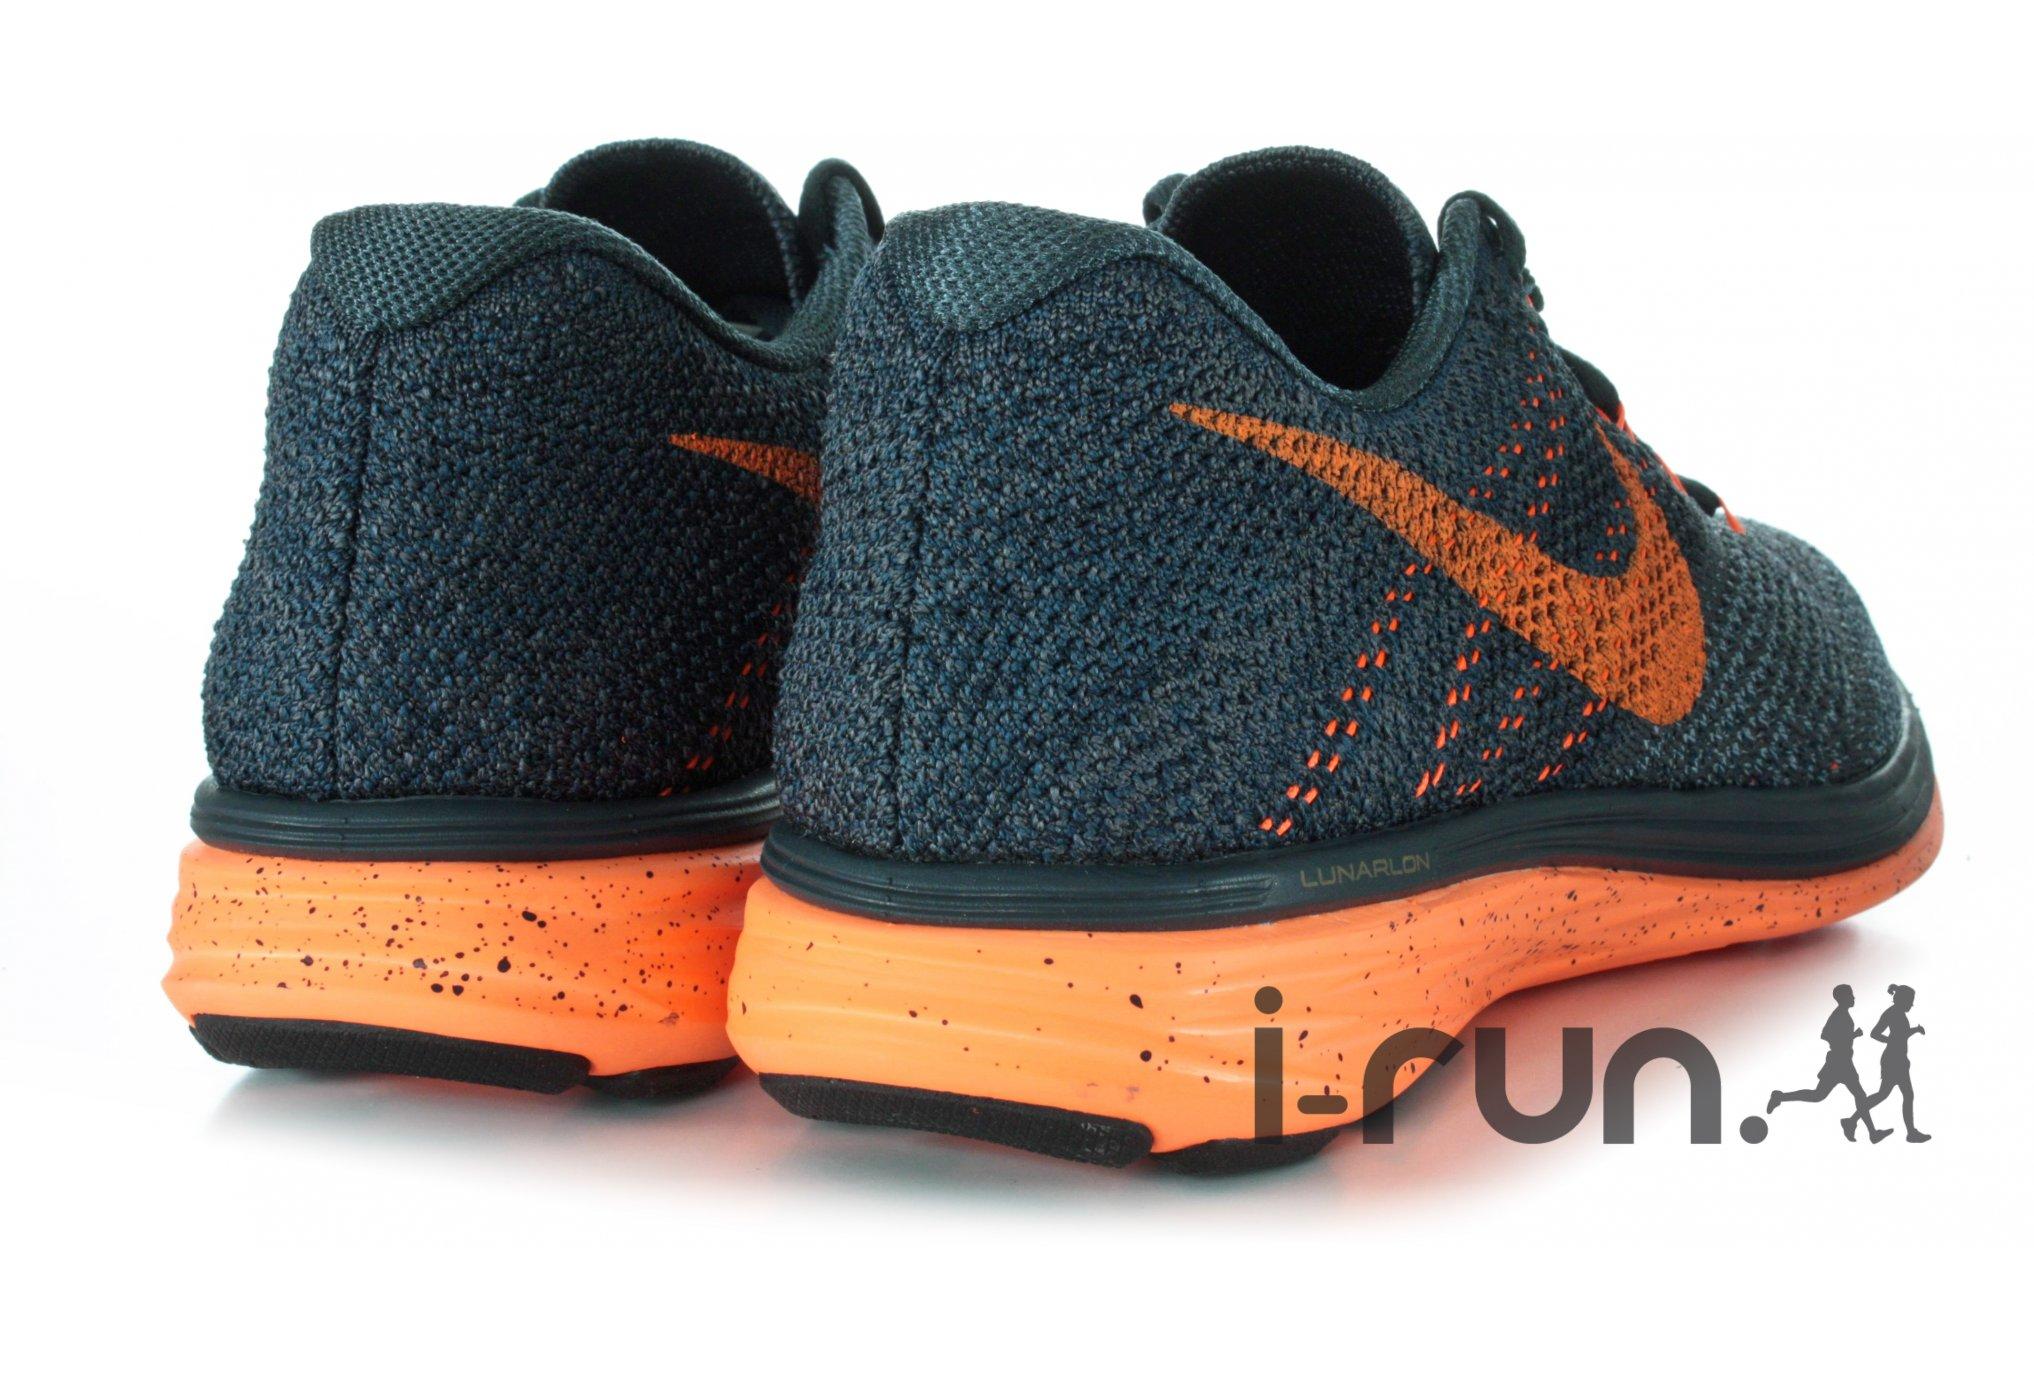 64c67269fbca ... good 25fa0 c3608 Nike Flyknit Lunar 3 Femme Avis .